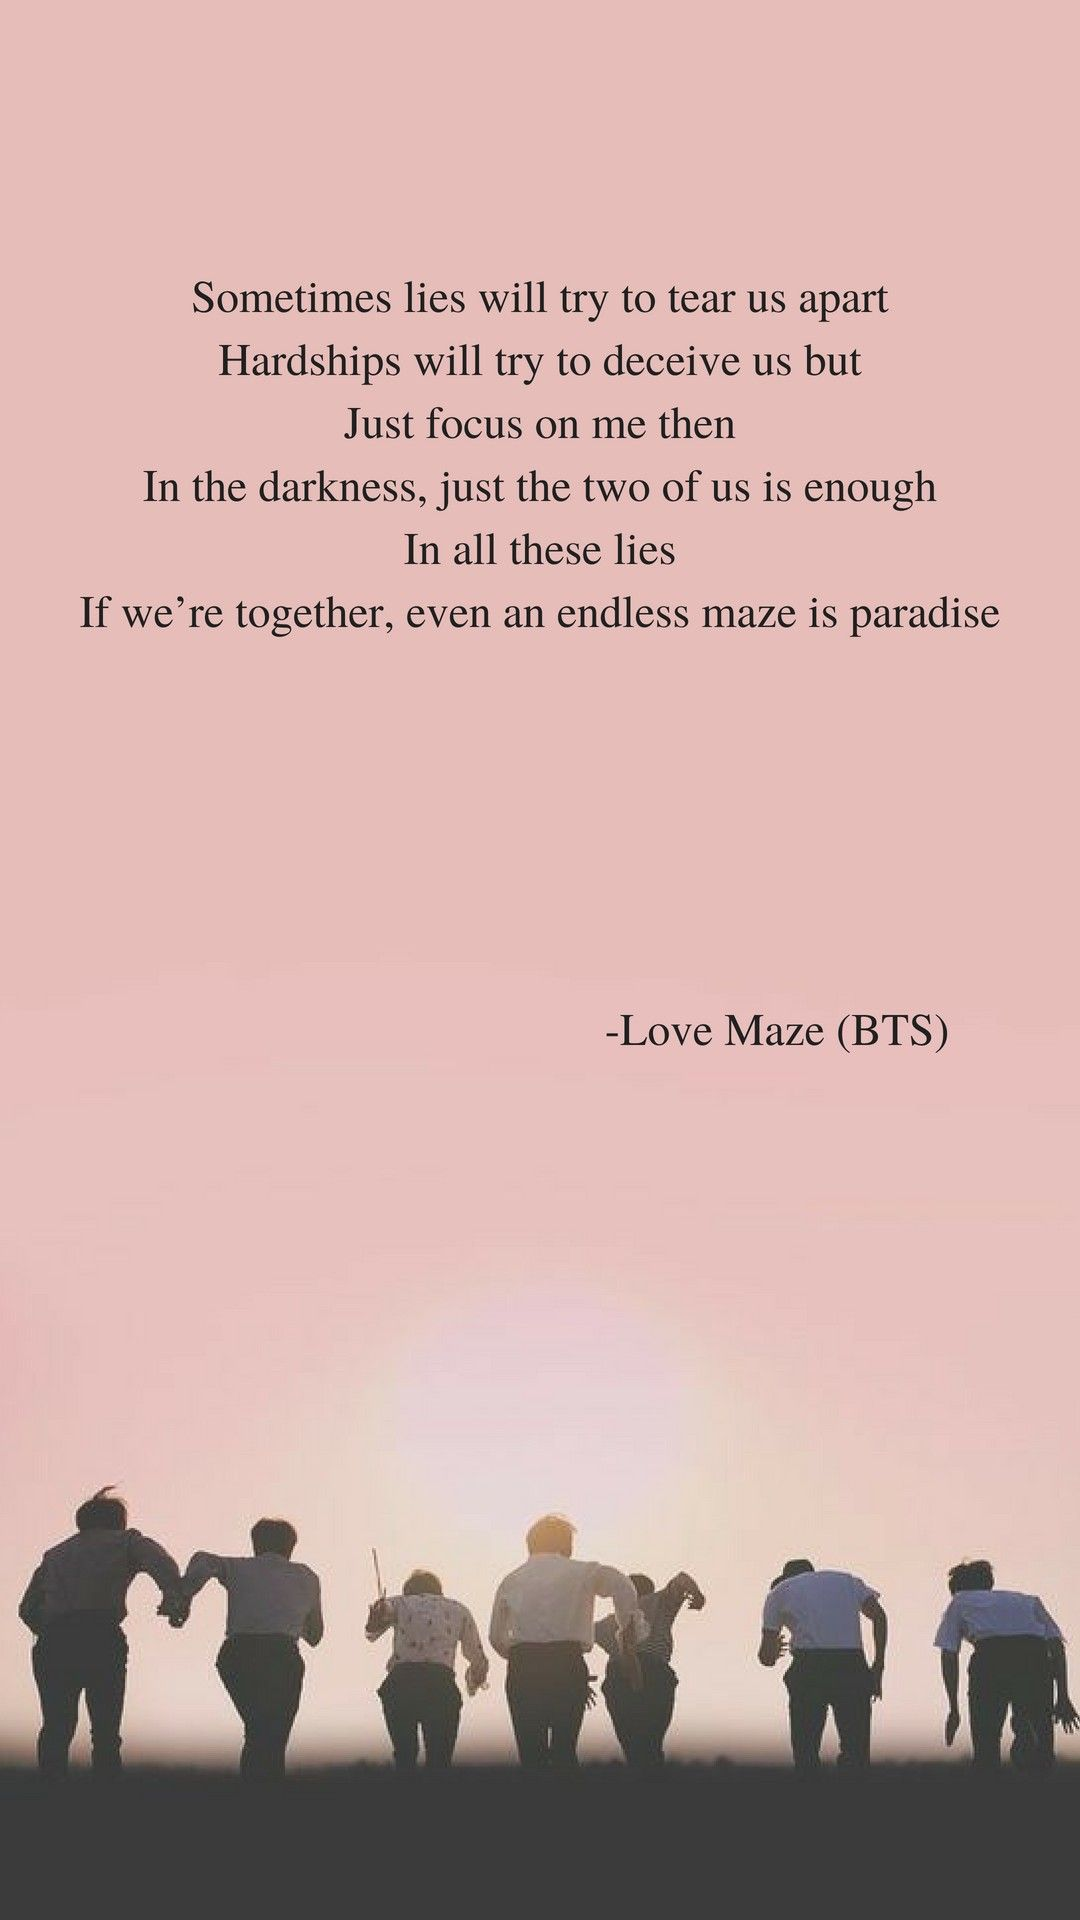 Love Maze (BTS) lyrics wallpaper